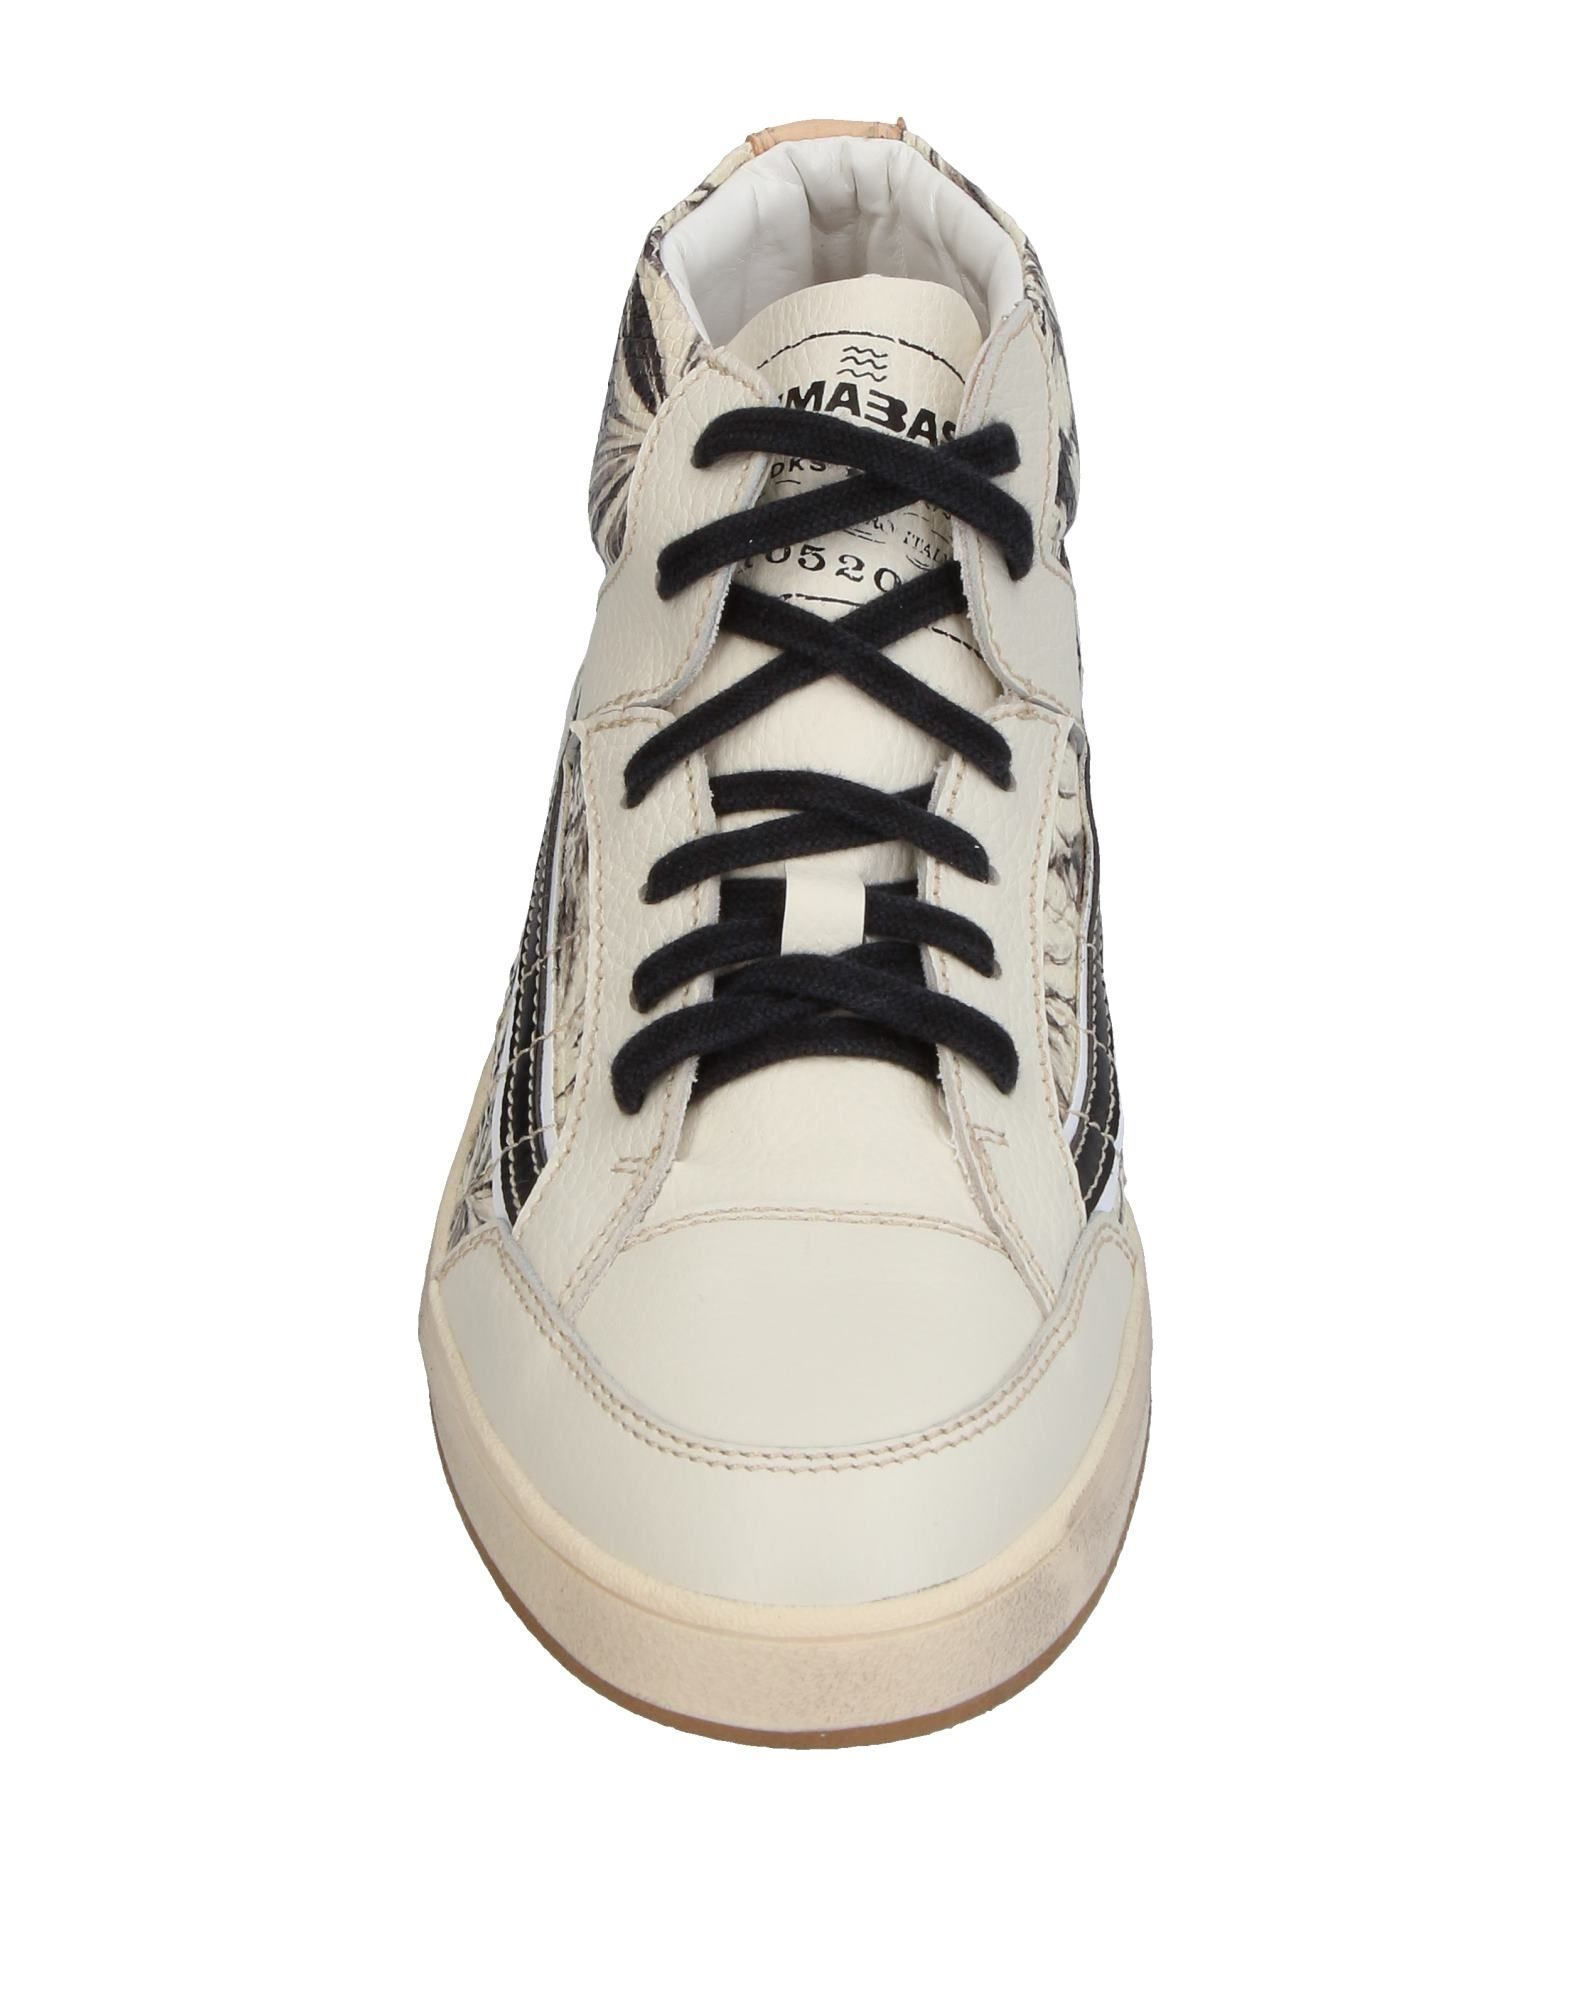 11385777WR Primabase Sneakers Herren  11385777WR  Heiße Schuhe 5dfbe2